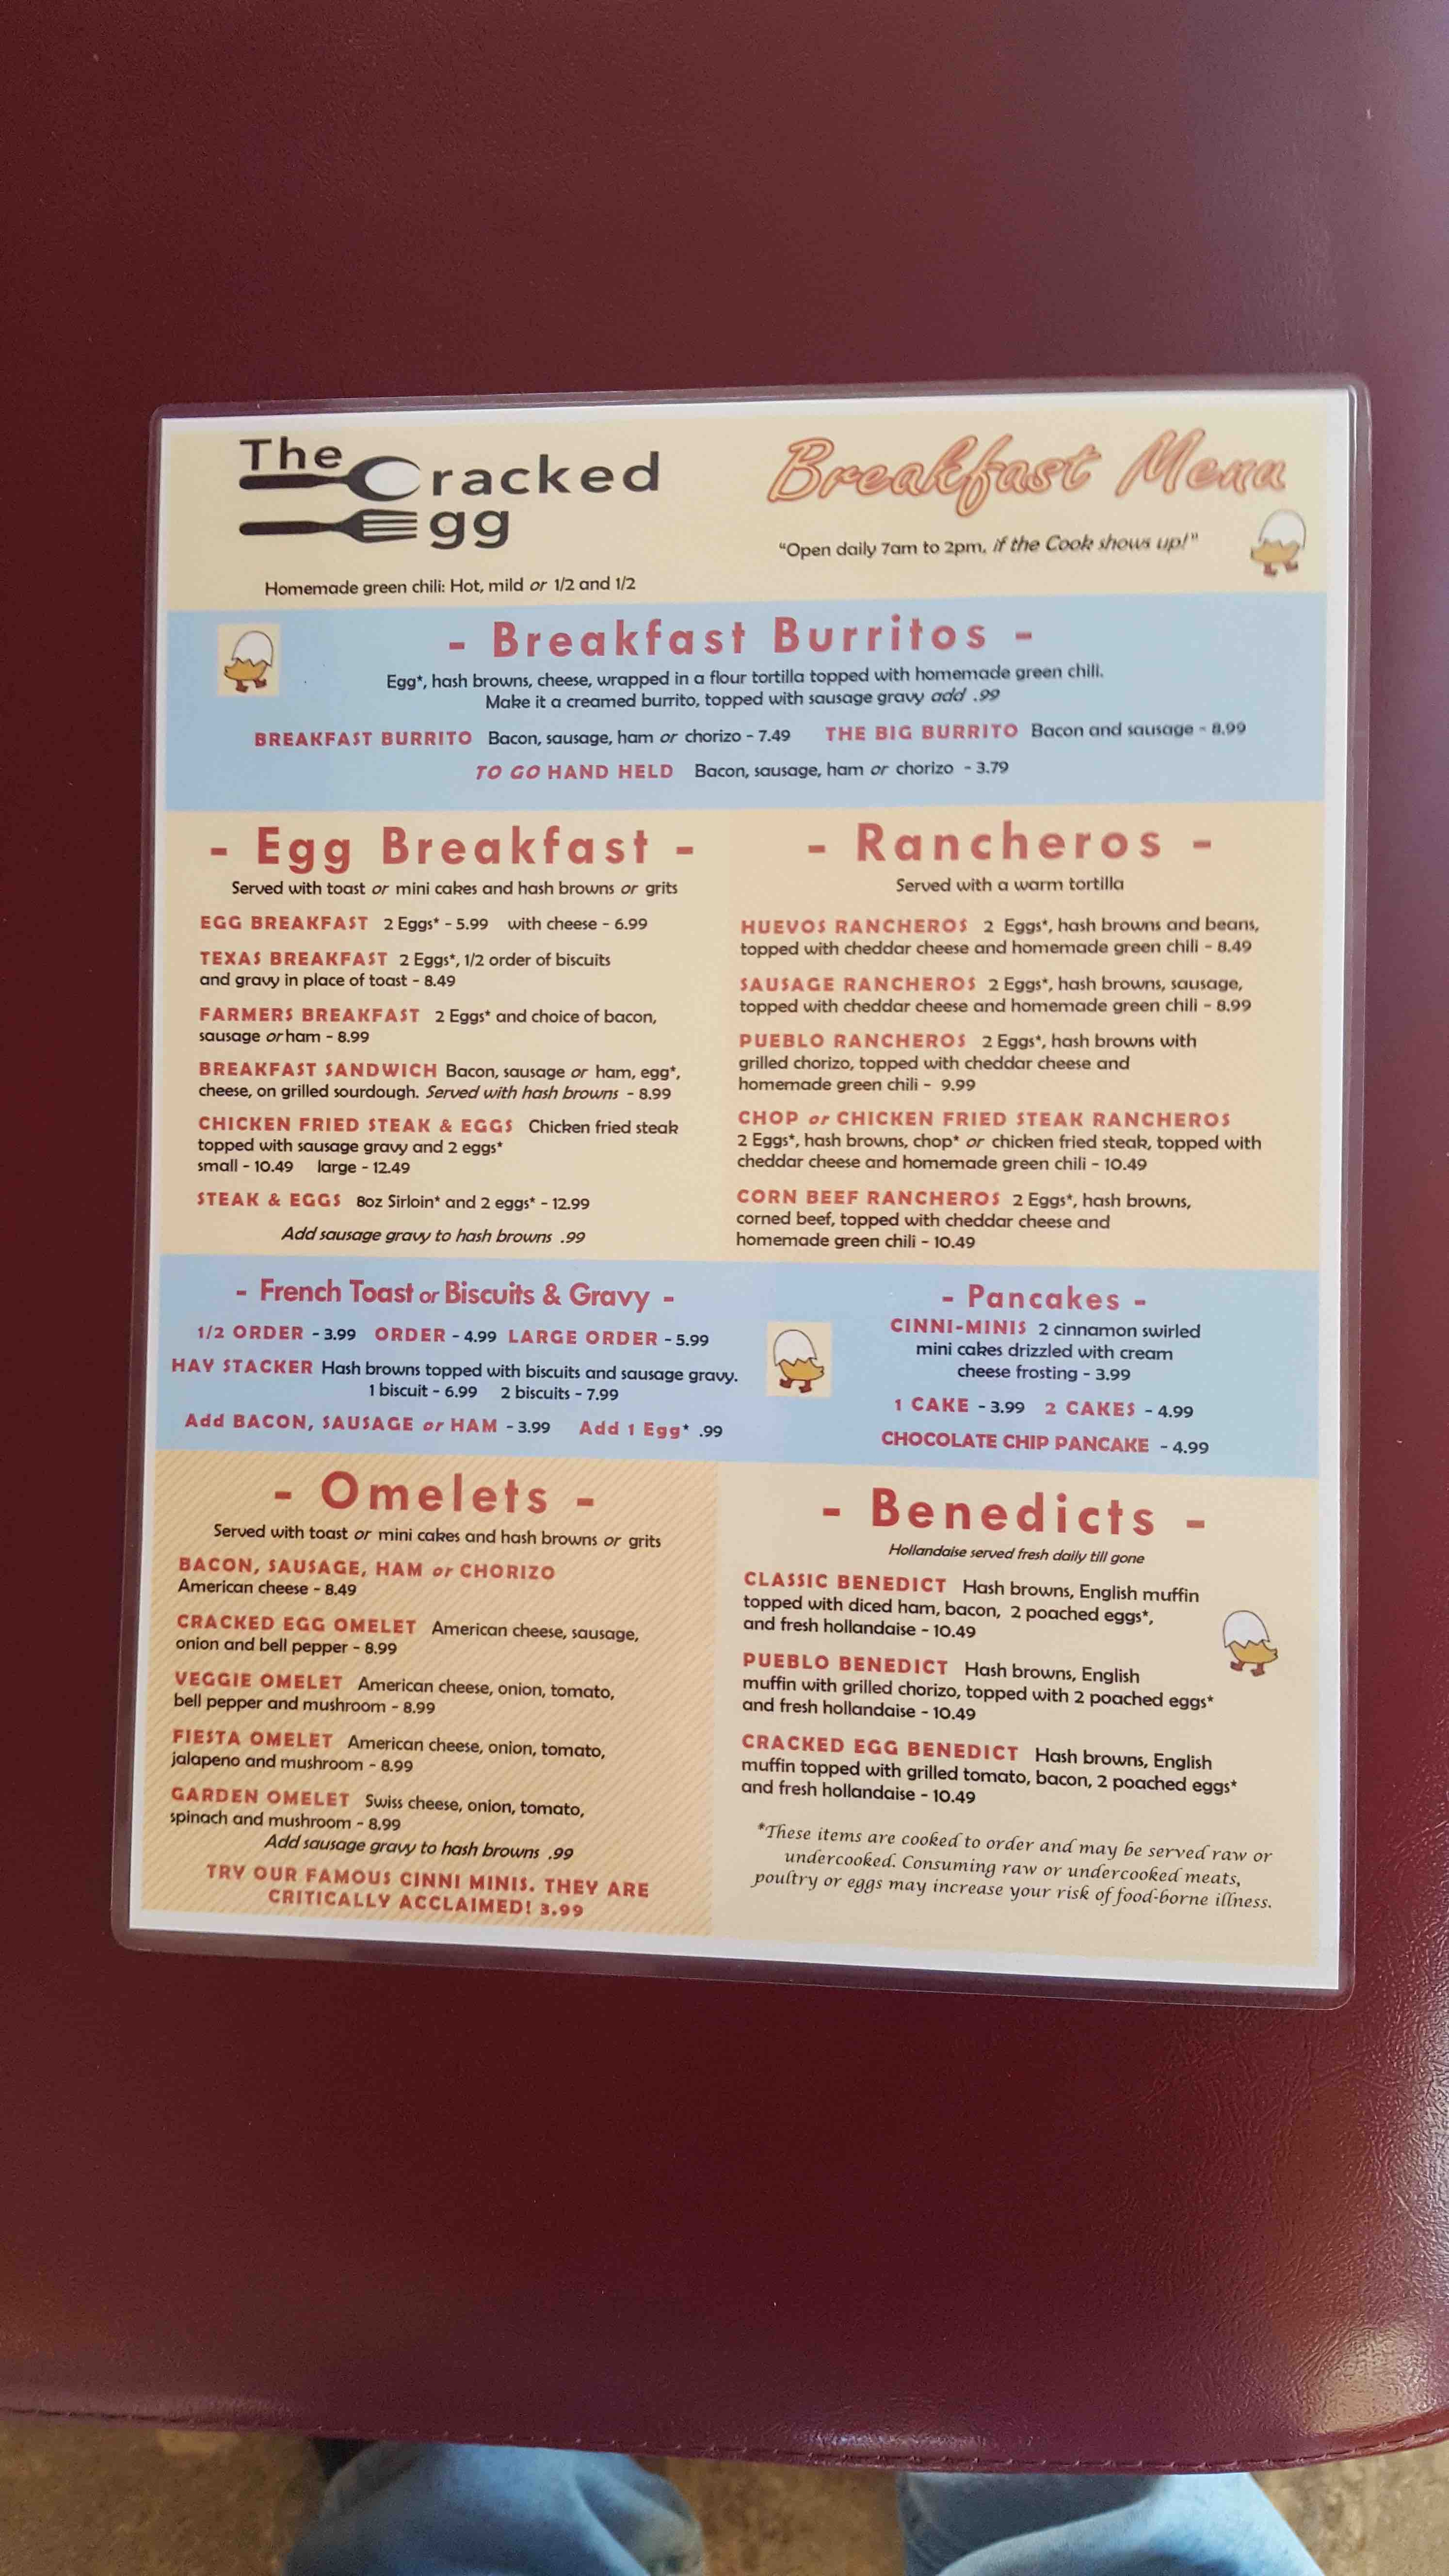 cracked egg milliken menu